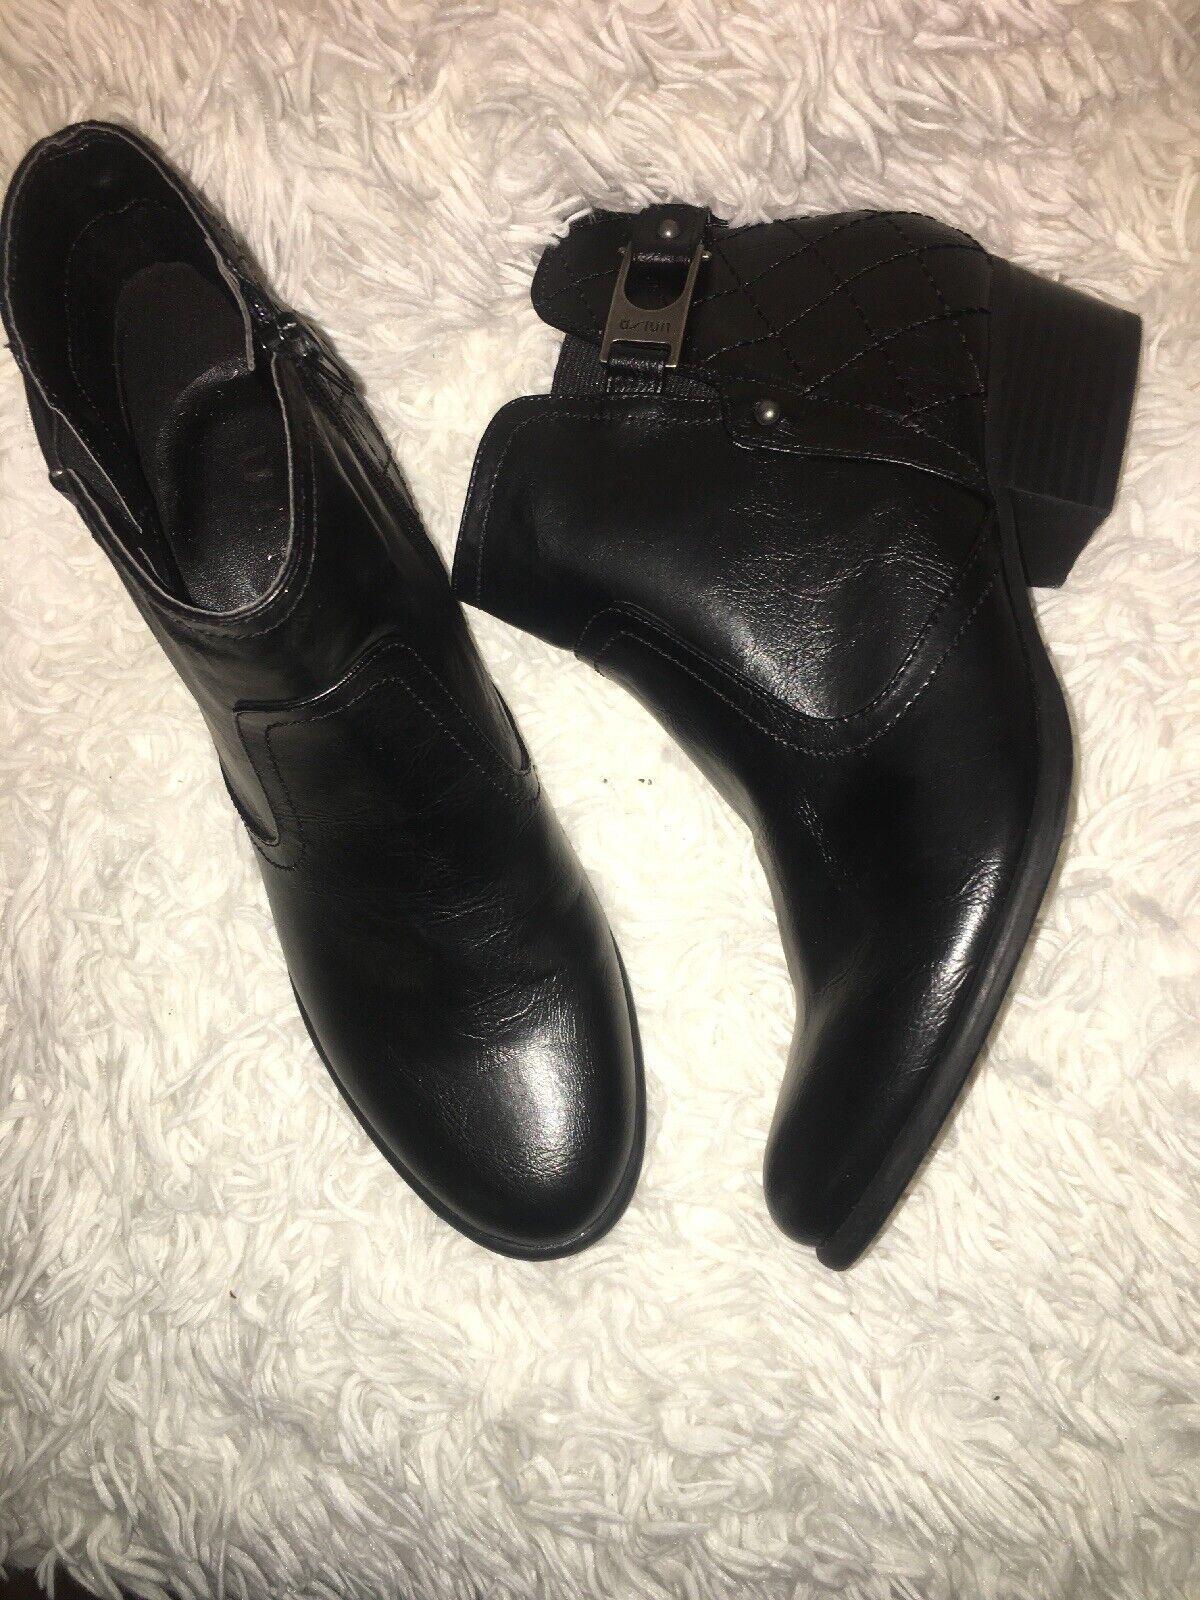 Unisa Black Ankle Booties Boots Side Zip sz 9 m new